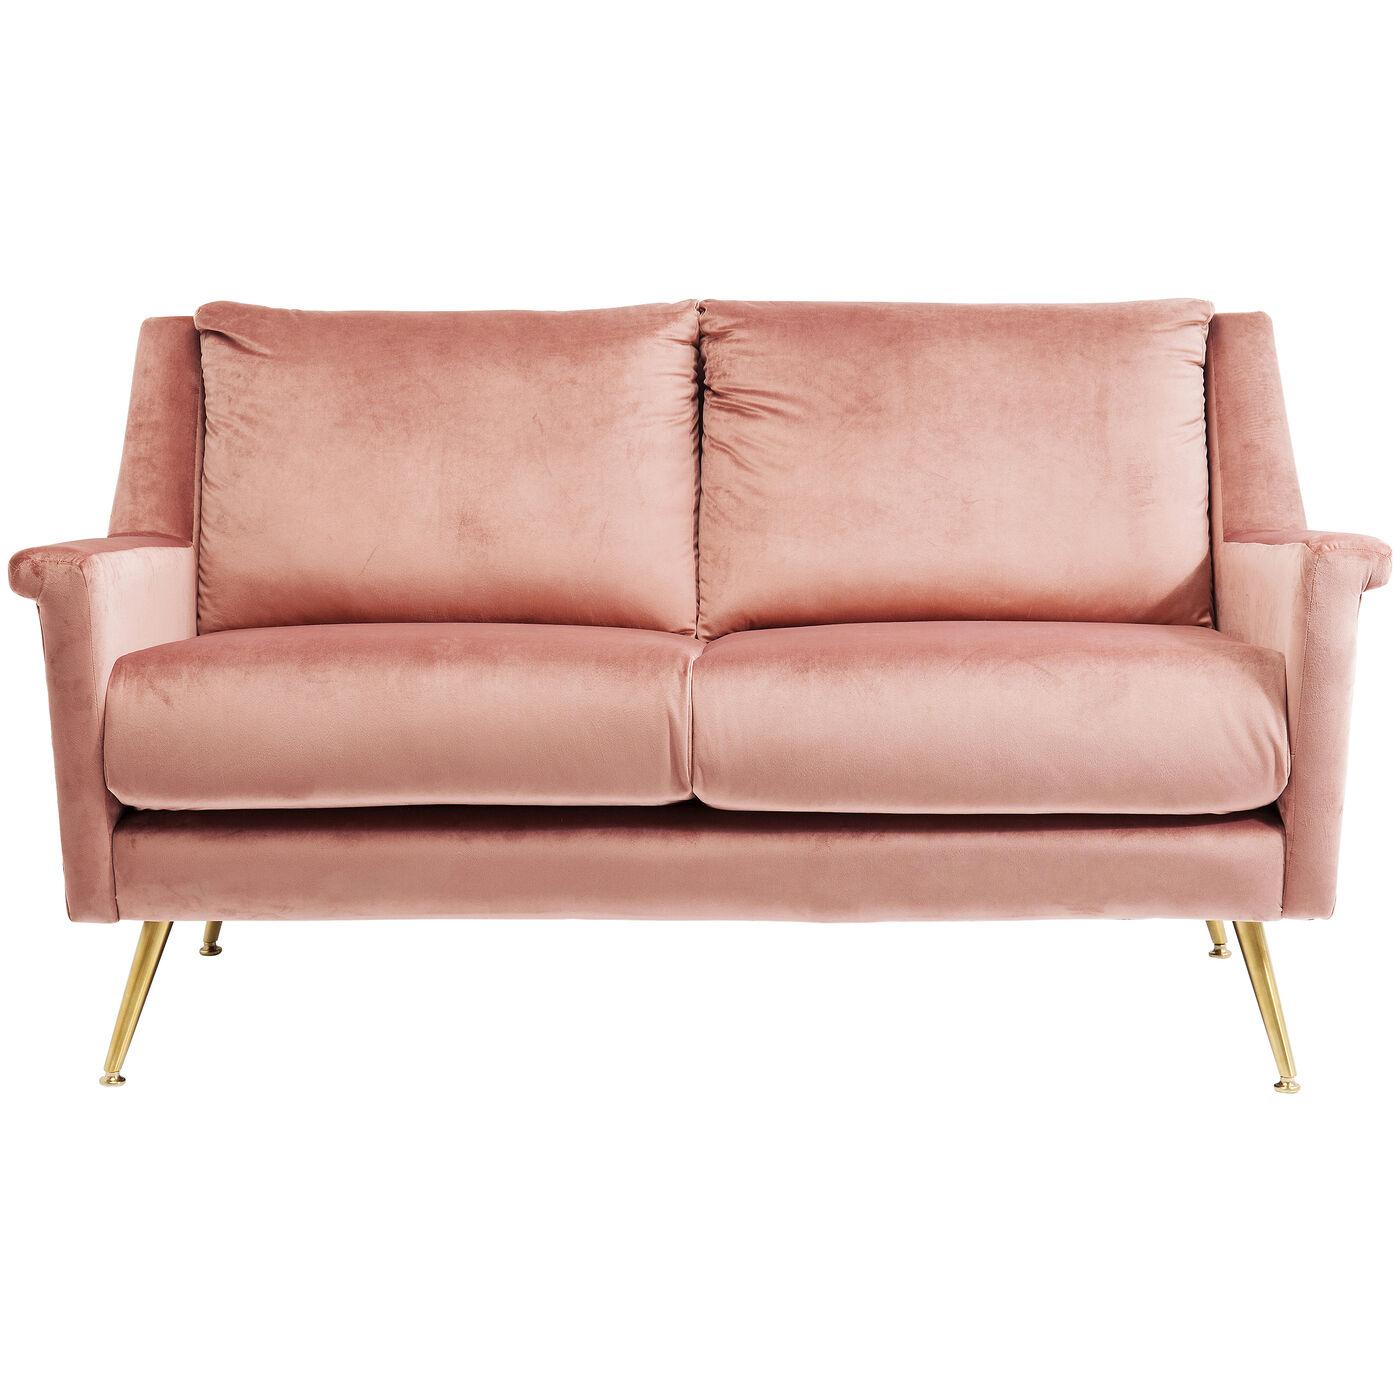 Sofa San Diego 2-Sitzer Rose 143cm